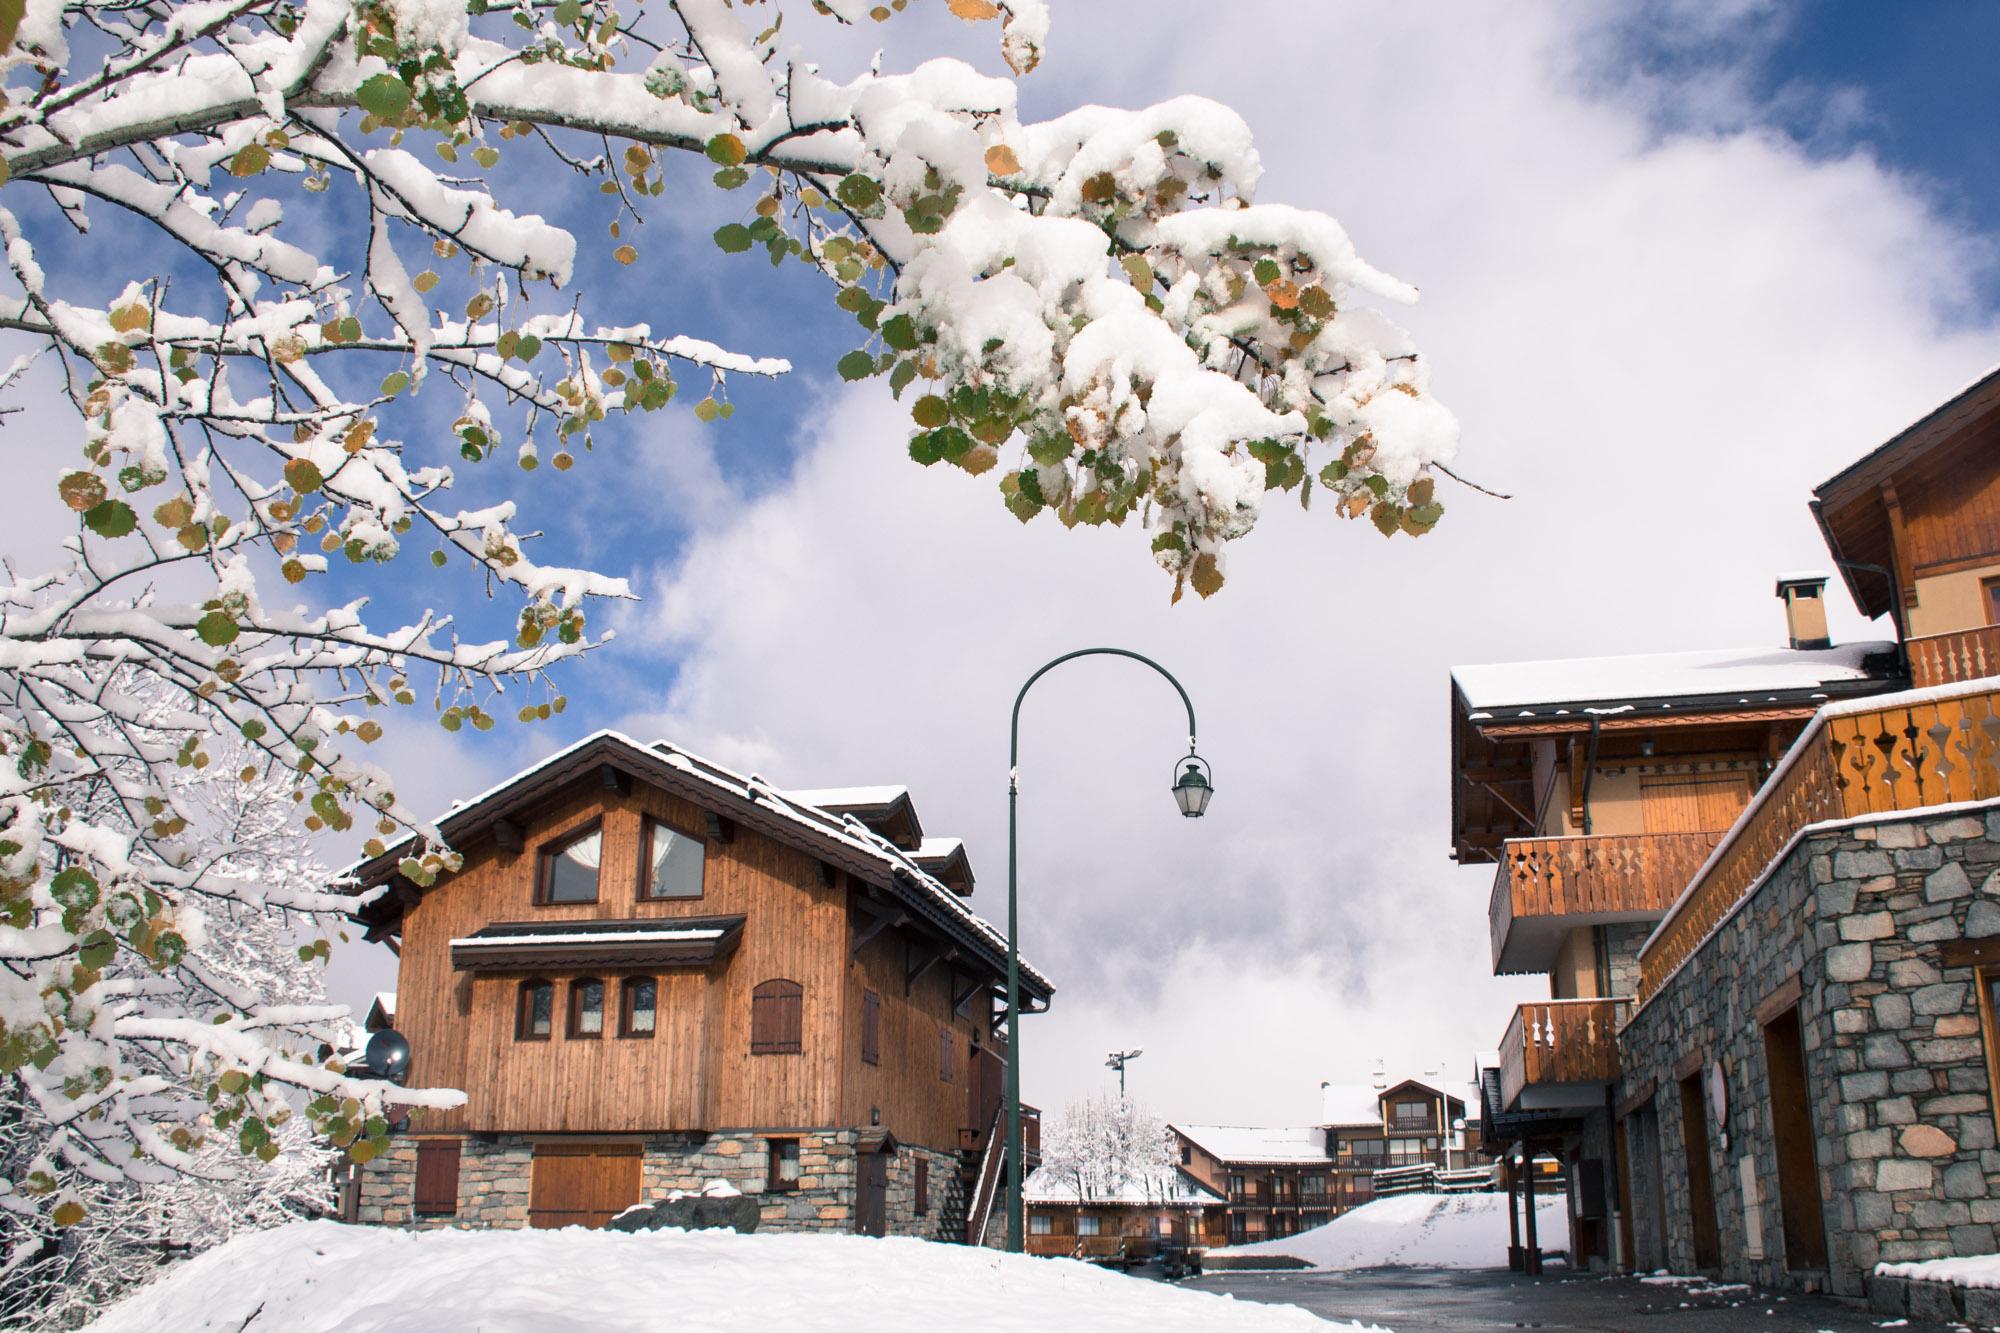 Ski-in ski-out chalet 3 Valleys